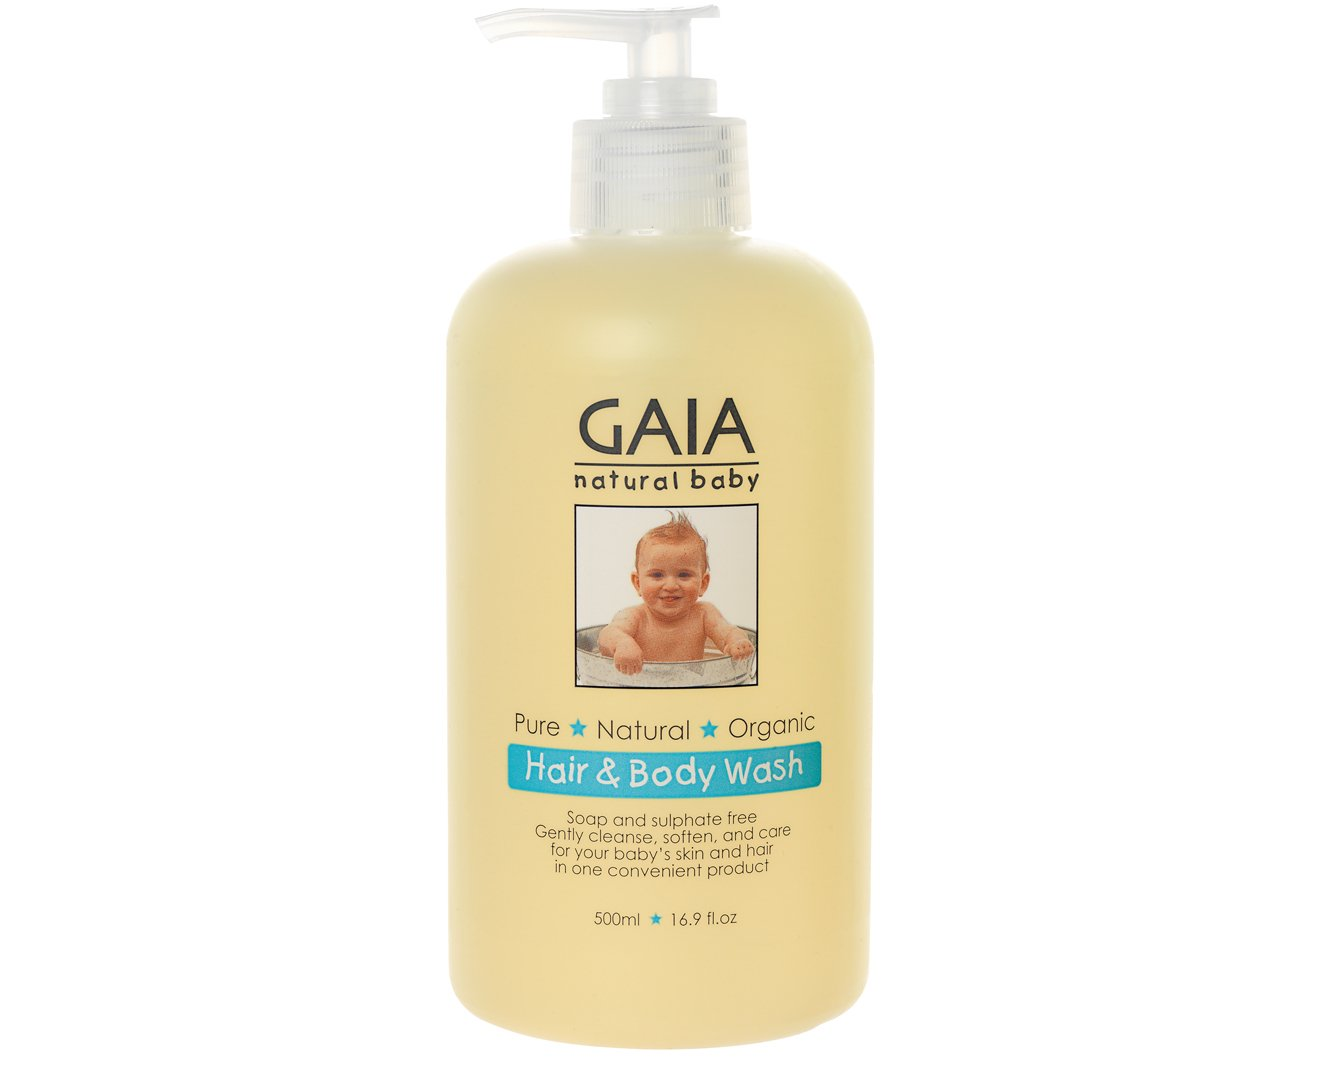 Hair and Body Wash 500mlm Gaia